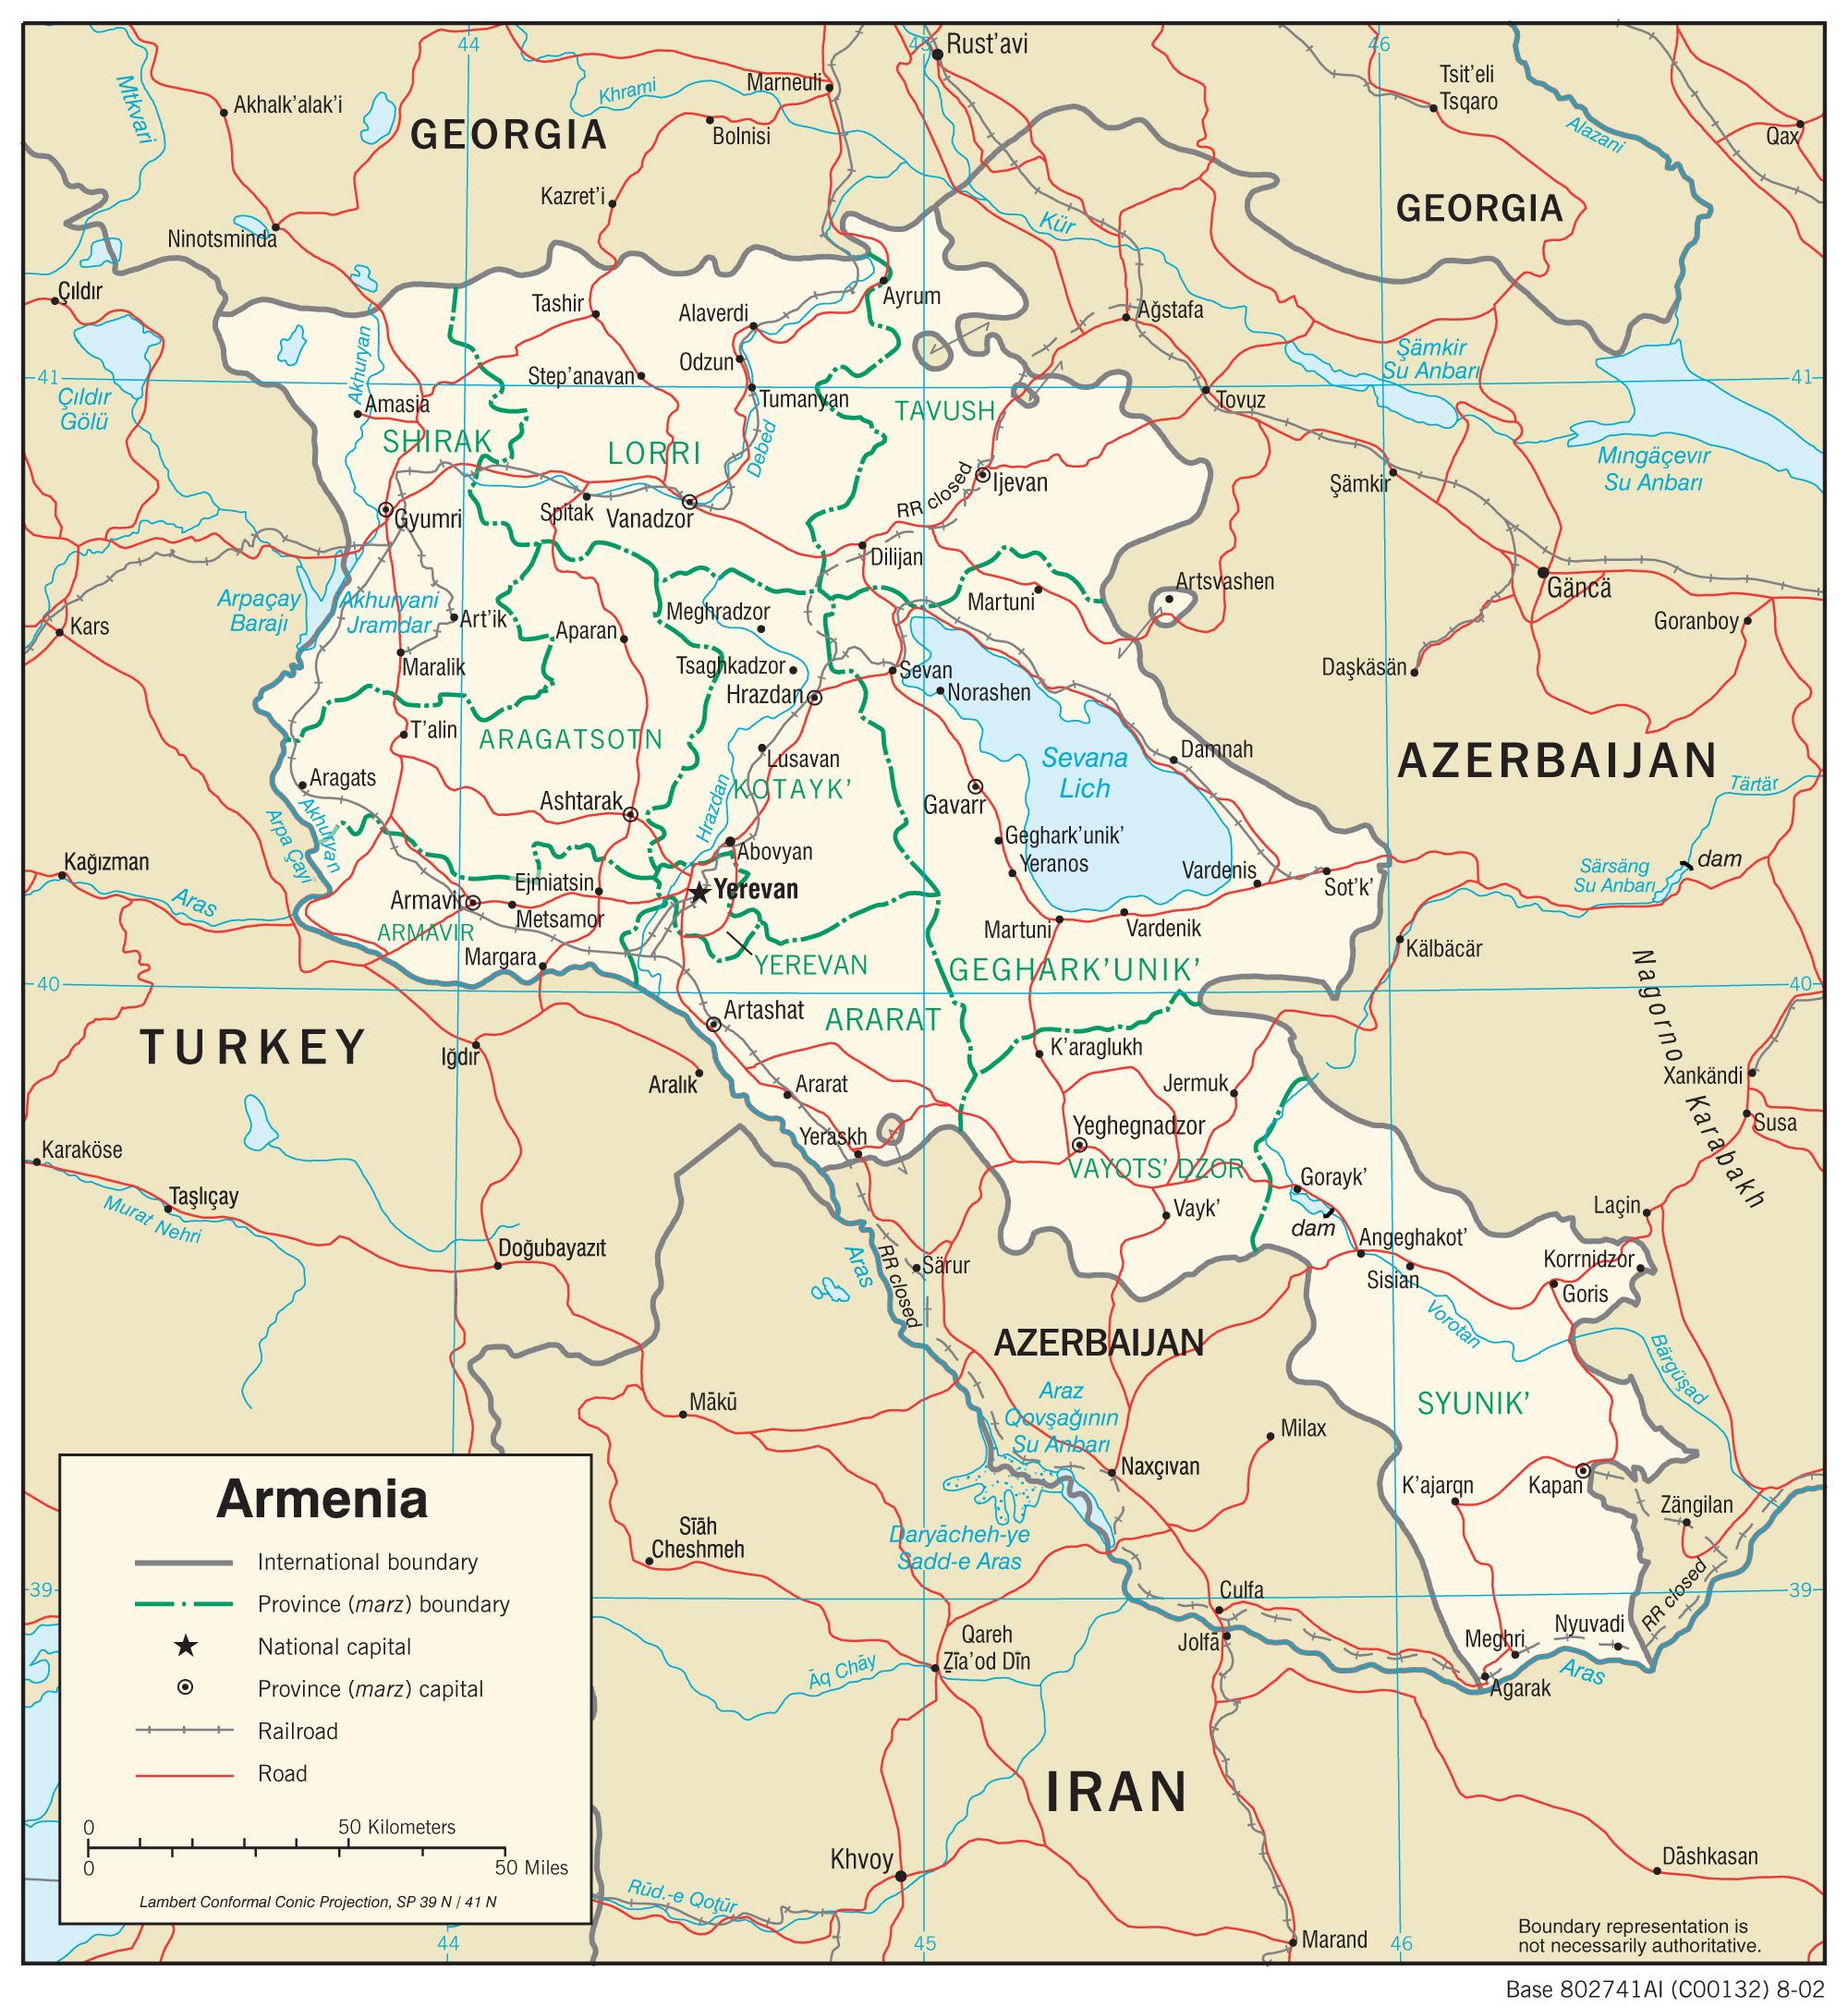 My neighbors for eight years: Turkey, Georgia, Iran, Azerbaijan and a day's drive from Baghdad, Iraq.